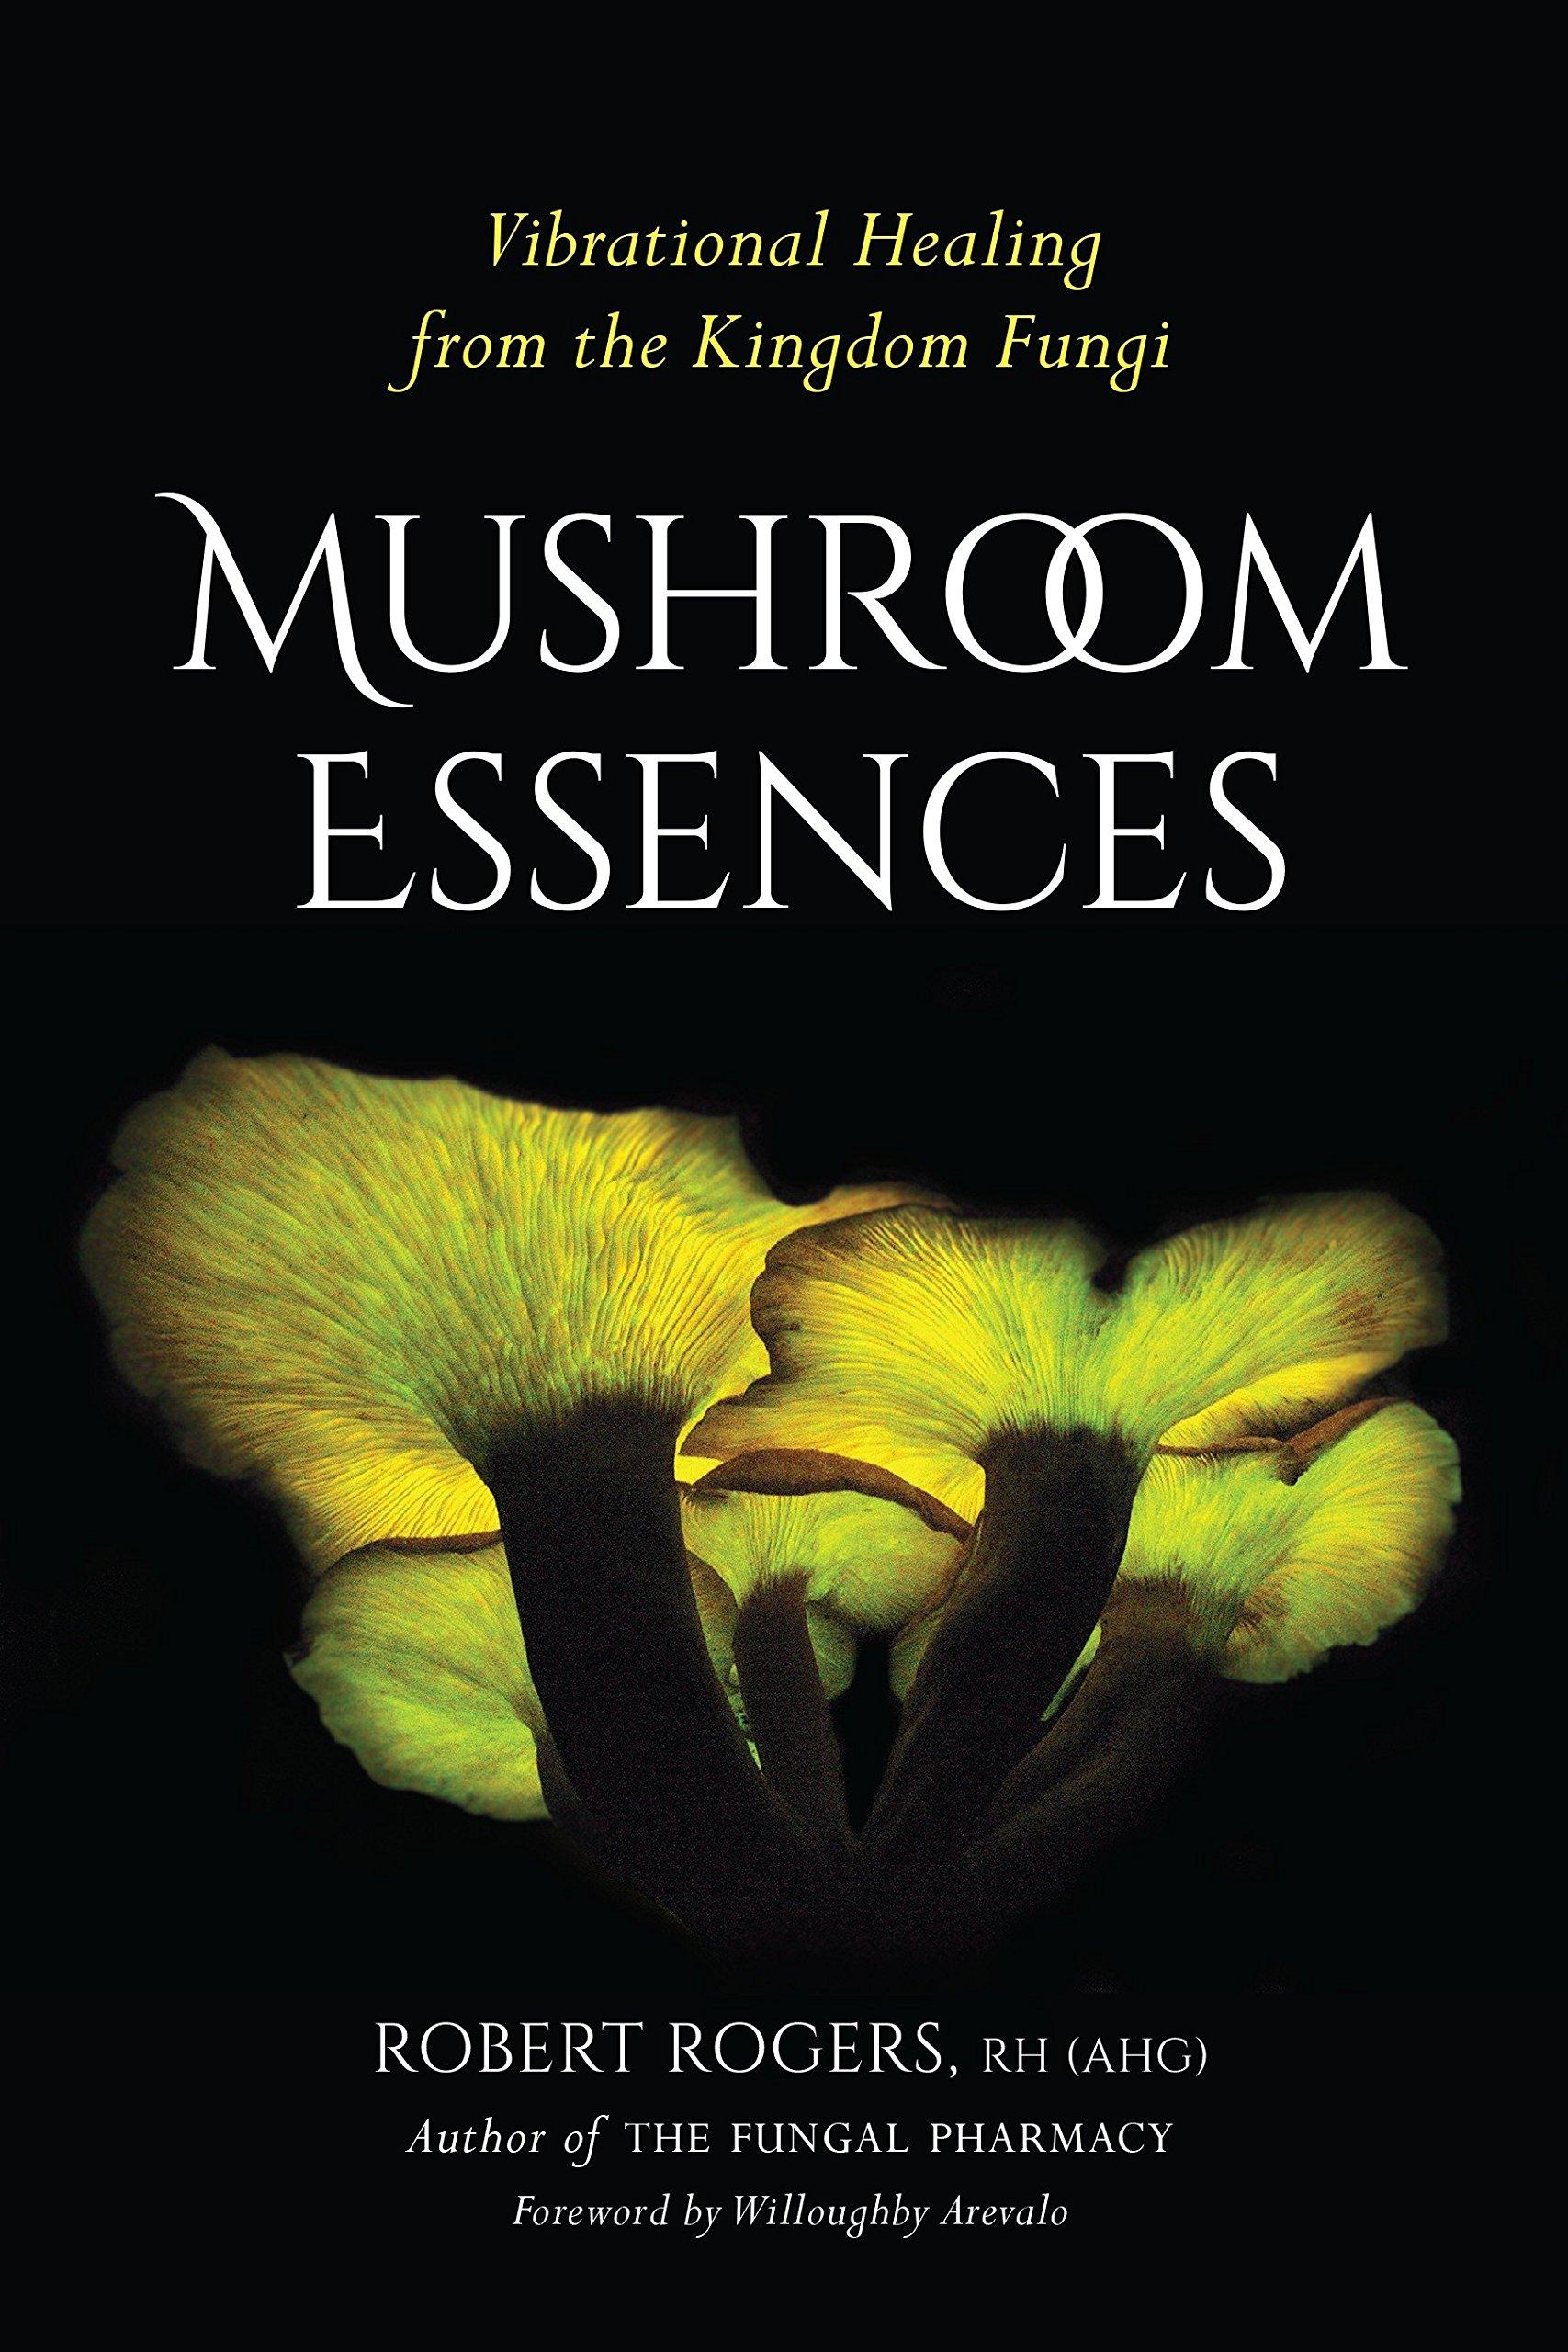 Download Mushroom Essences: Vibrational Healing from the Kingdom Fungi ebook